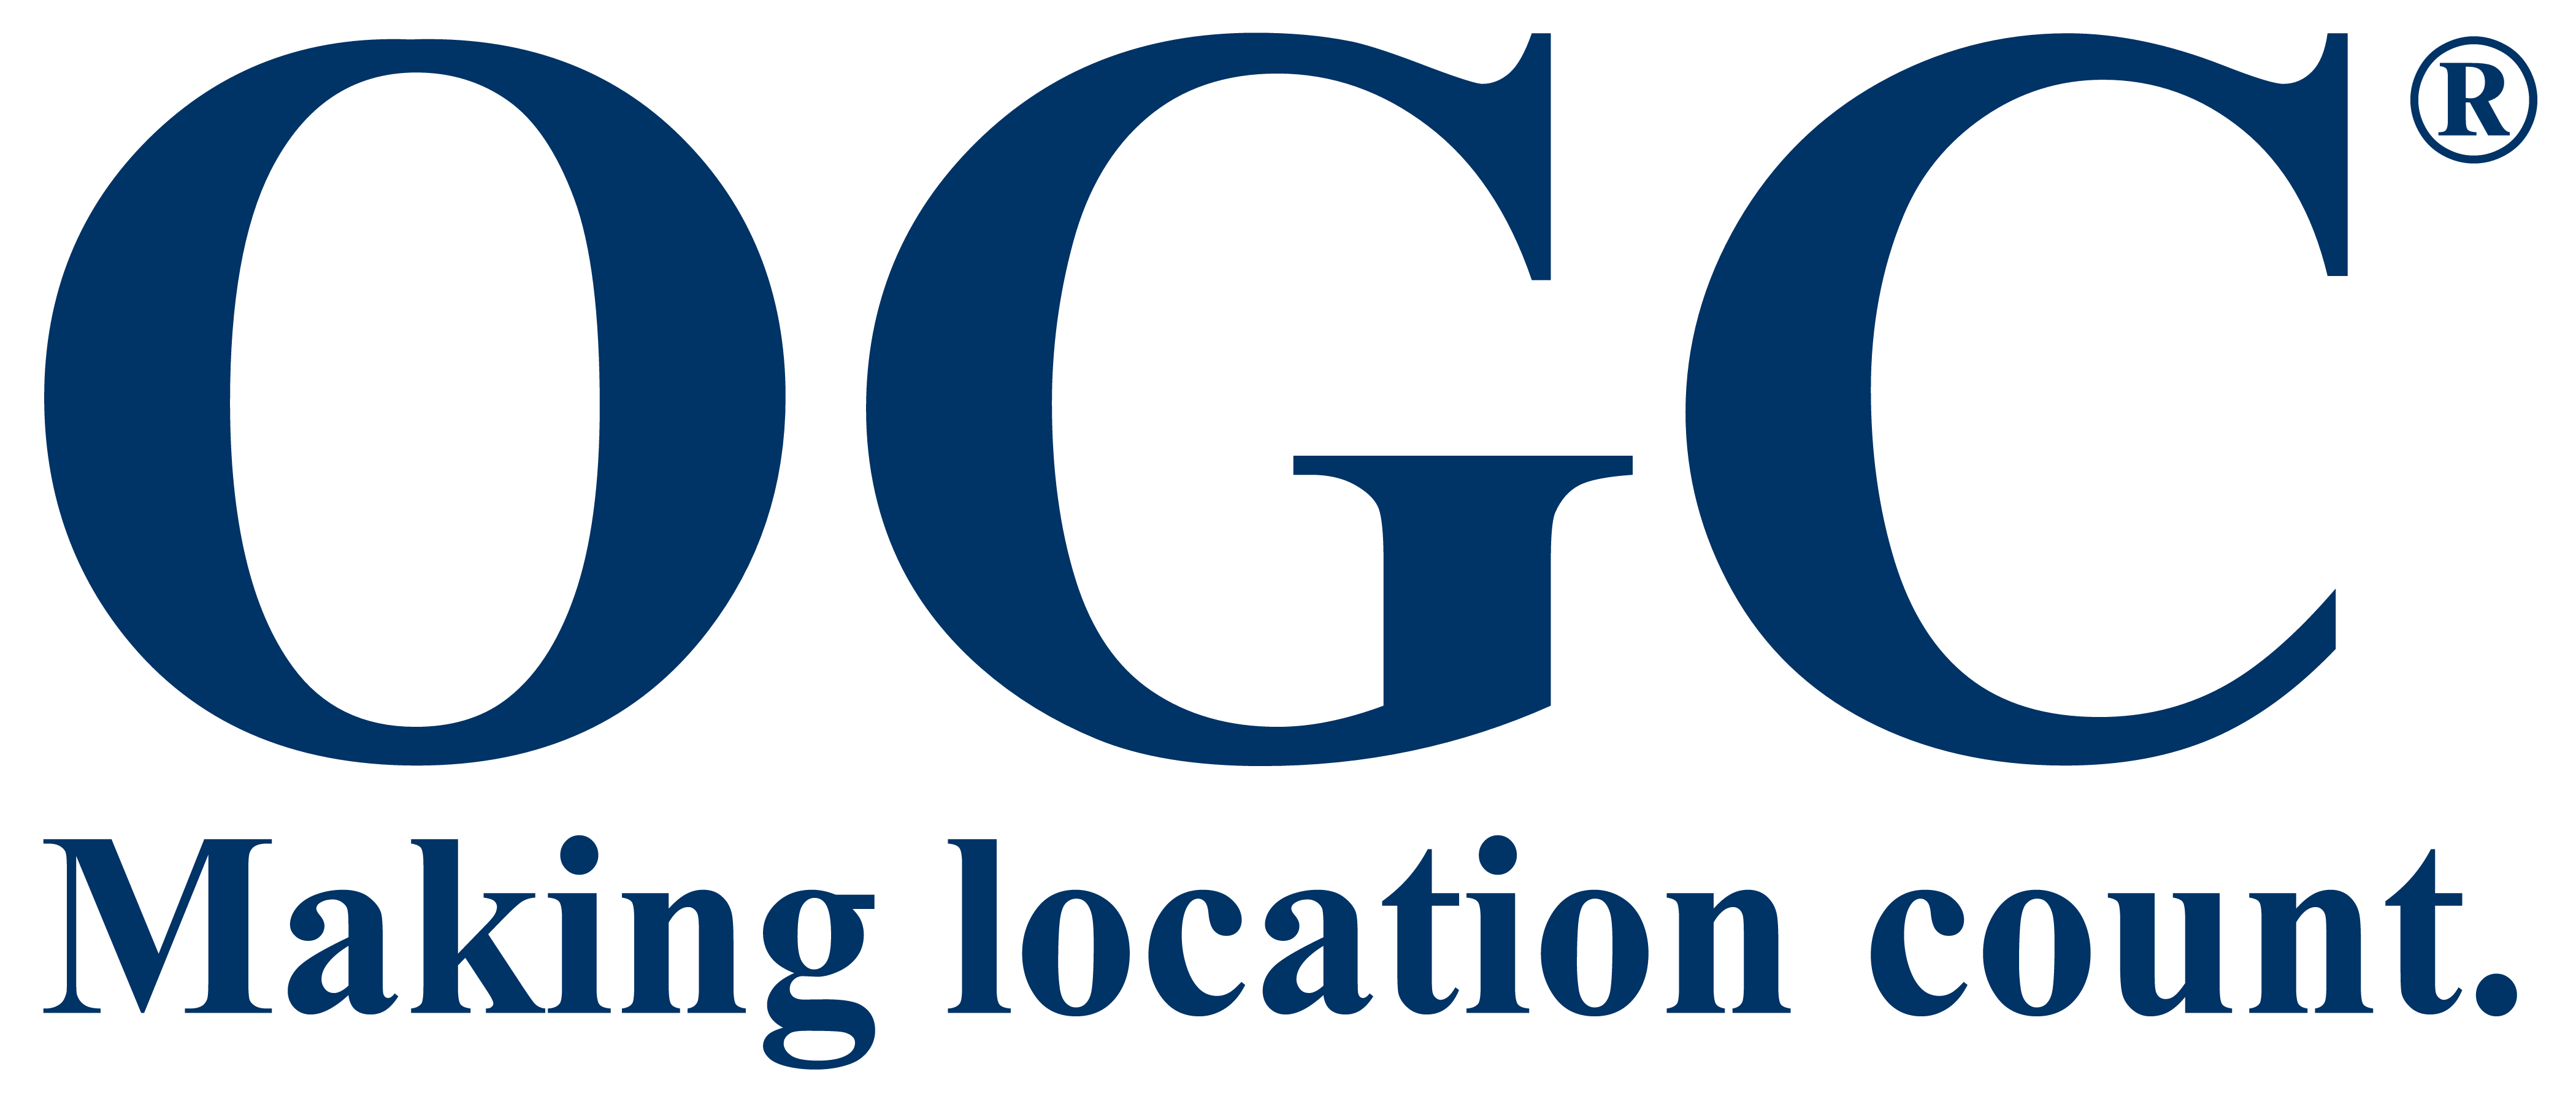 OGC GeoPackage